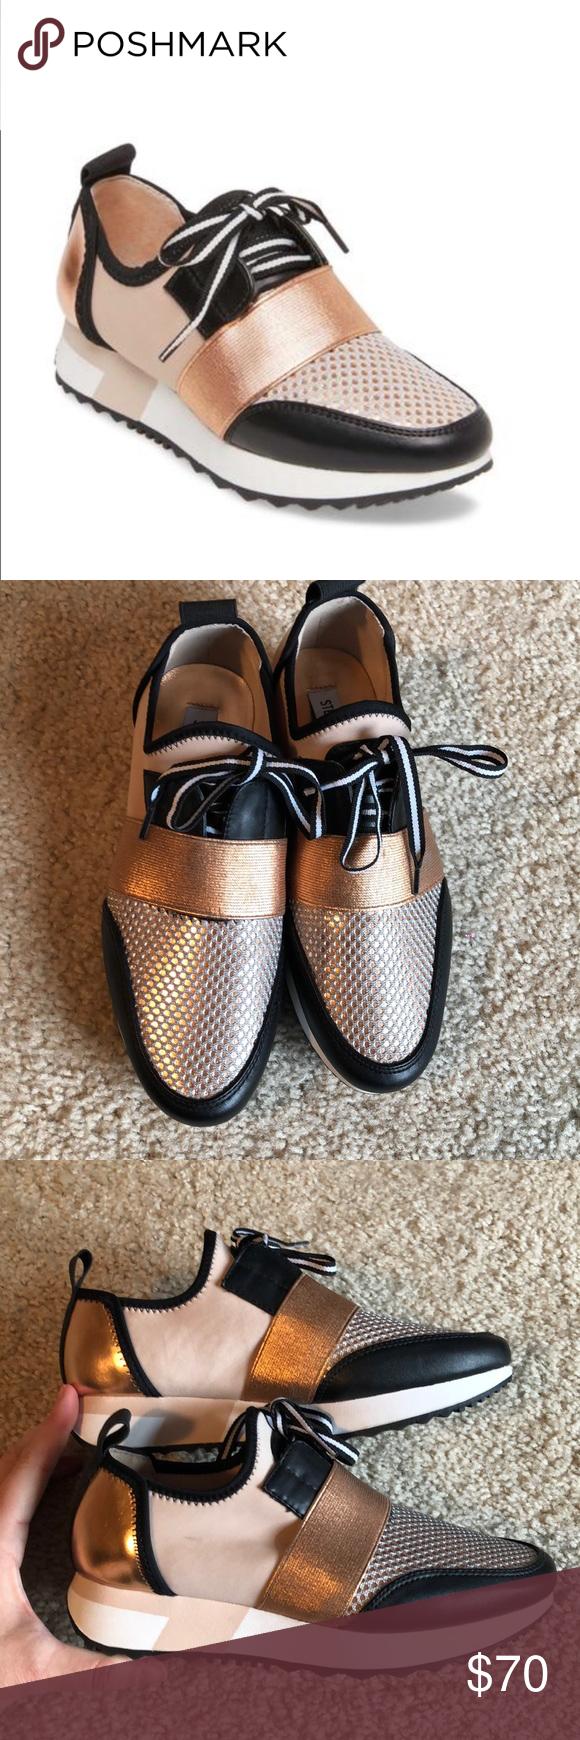 f363519e37f New! Steve Madden rose gold Antics Sneaker -6 Brand new. No box ...